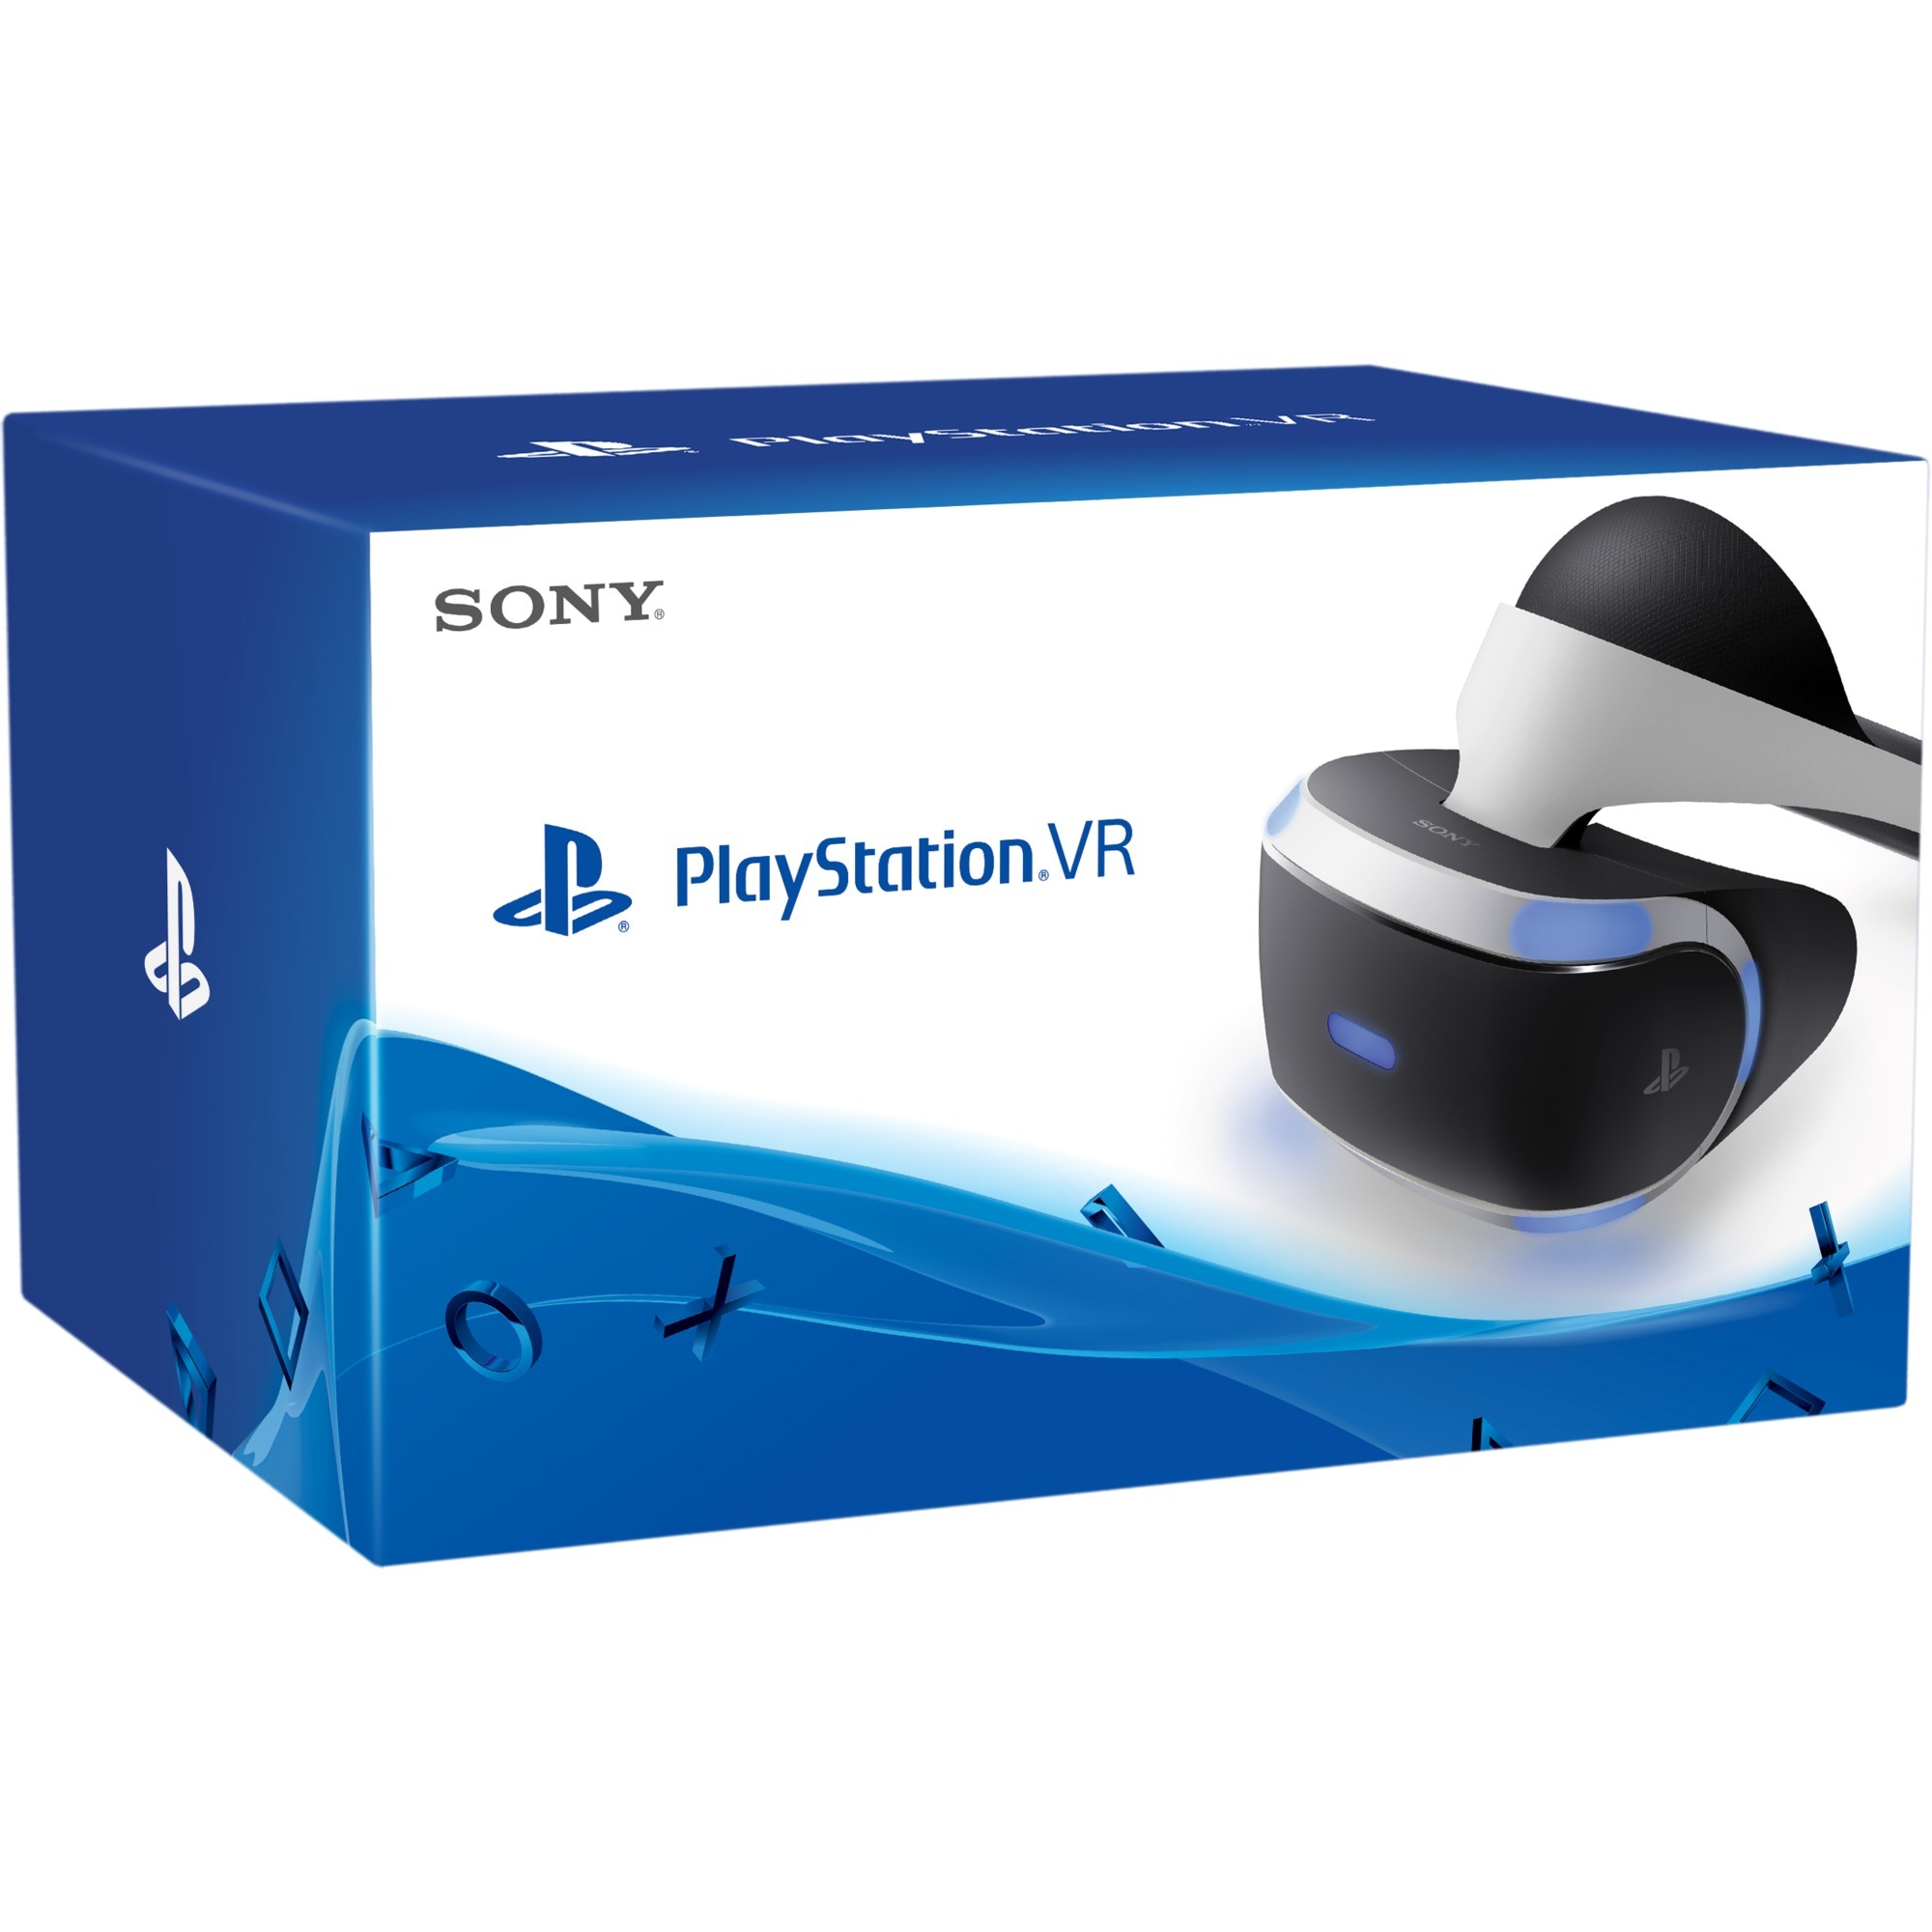 PlayStation VR, Occhiali VR